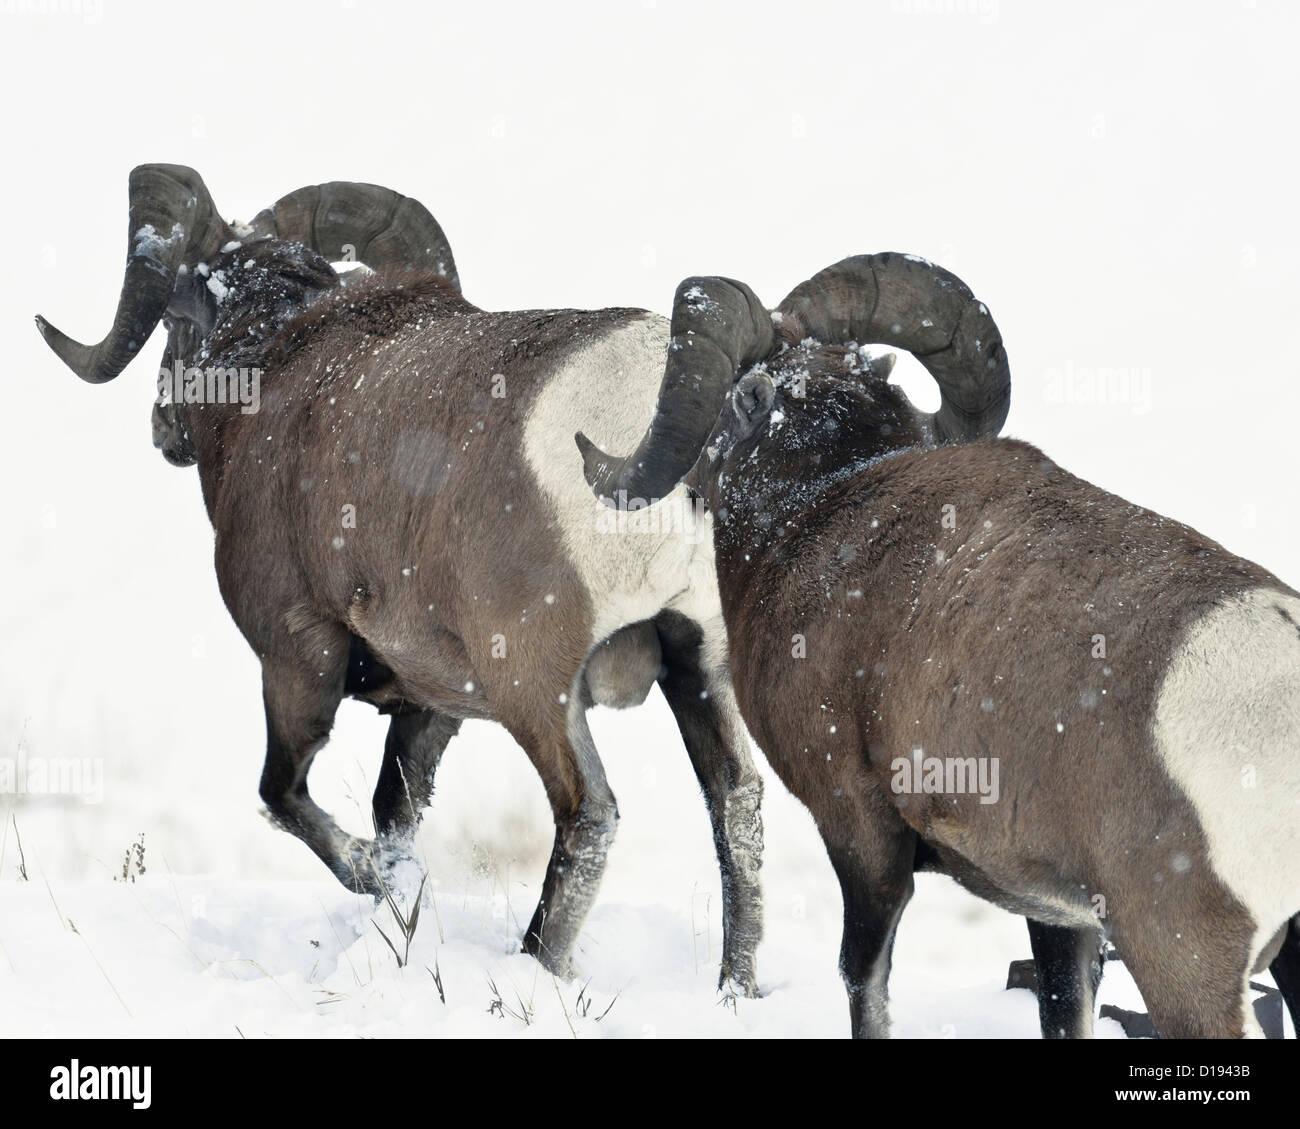 Two bighorn rams walking away through the deep winter snow. - Stock Image